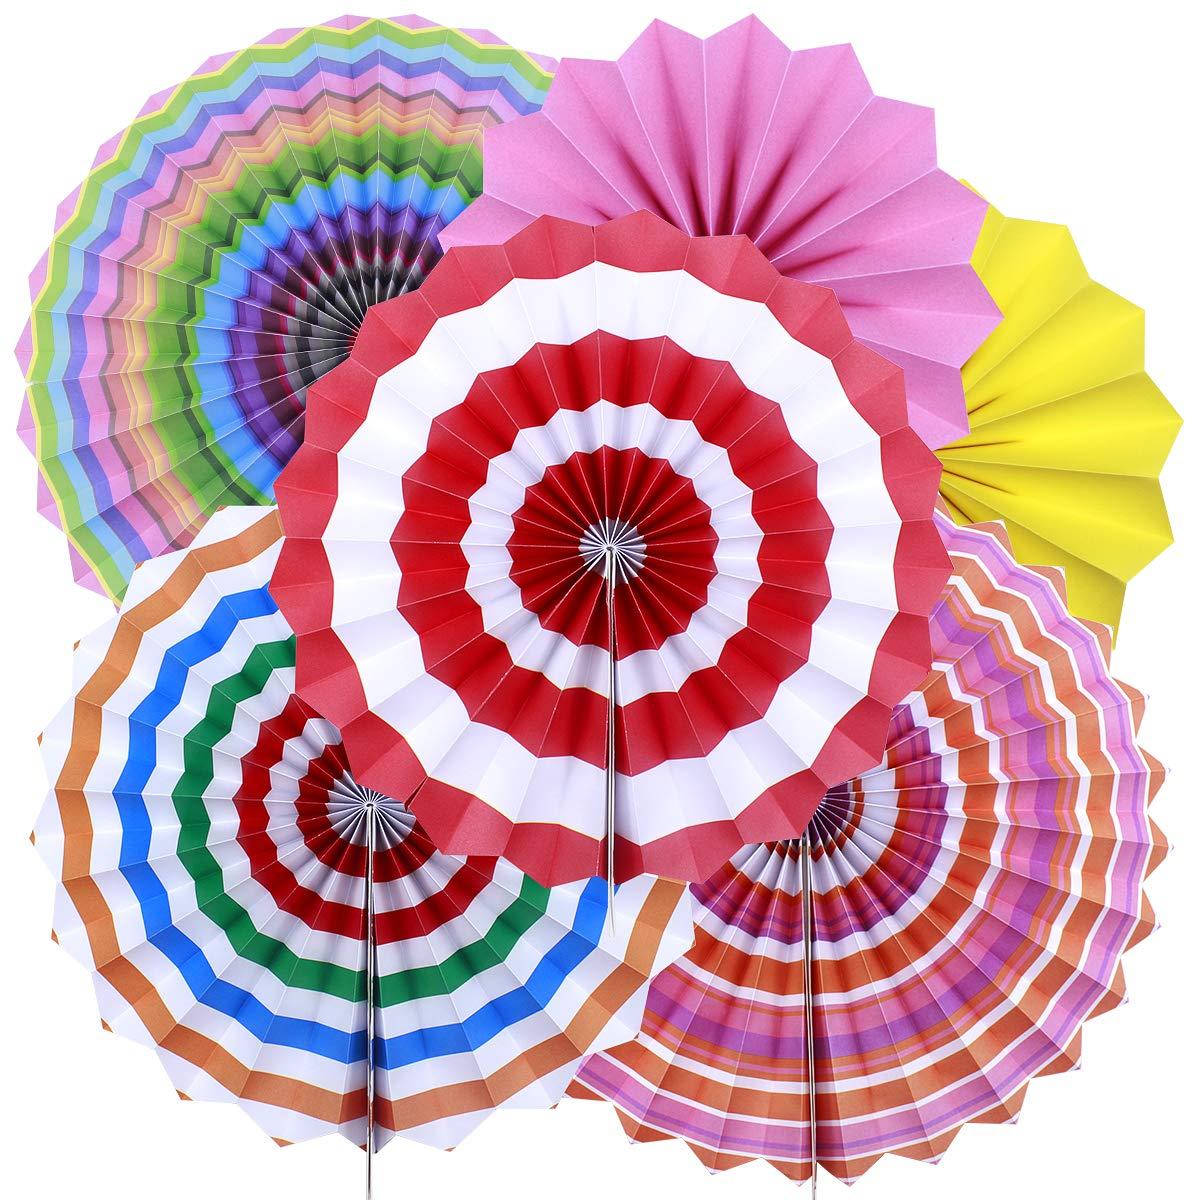 Natuce 6 Piezas Flor de abanico de papel Multicolor Ventilador de Papel Bola de la Flor decoraci/ón para celebraci/ón fiesta cumplea/ños boda Azul